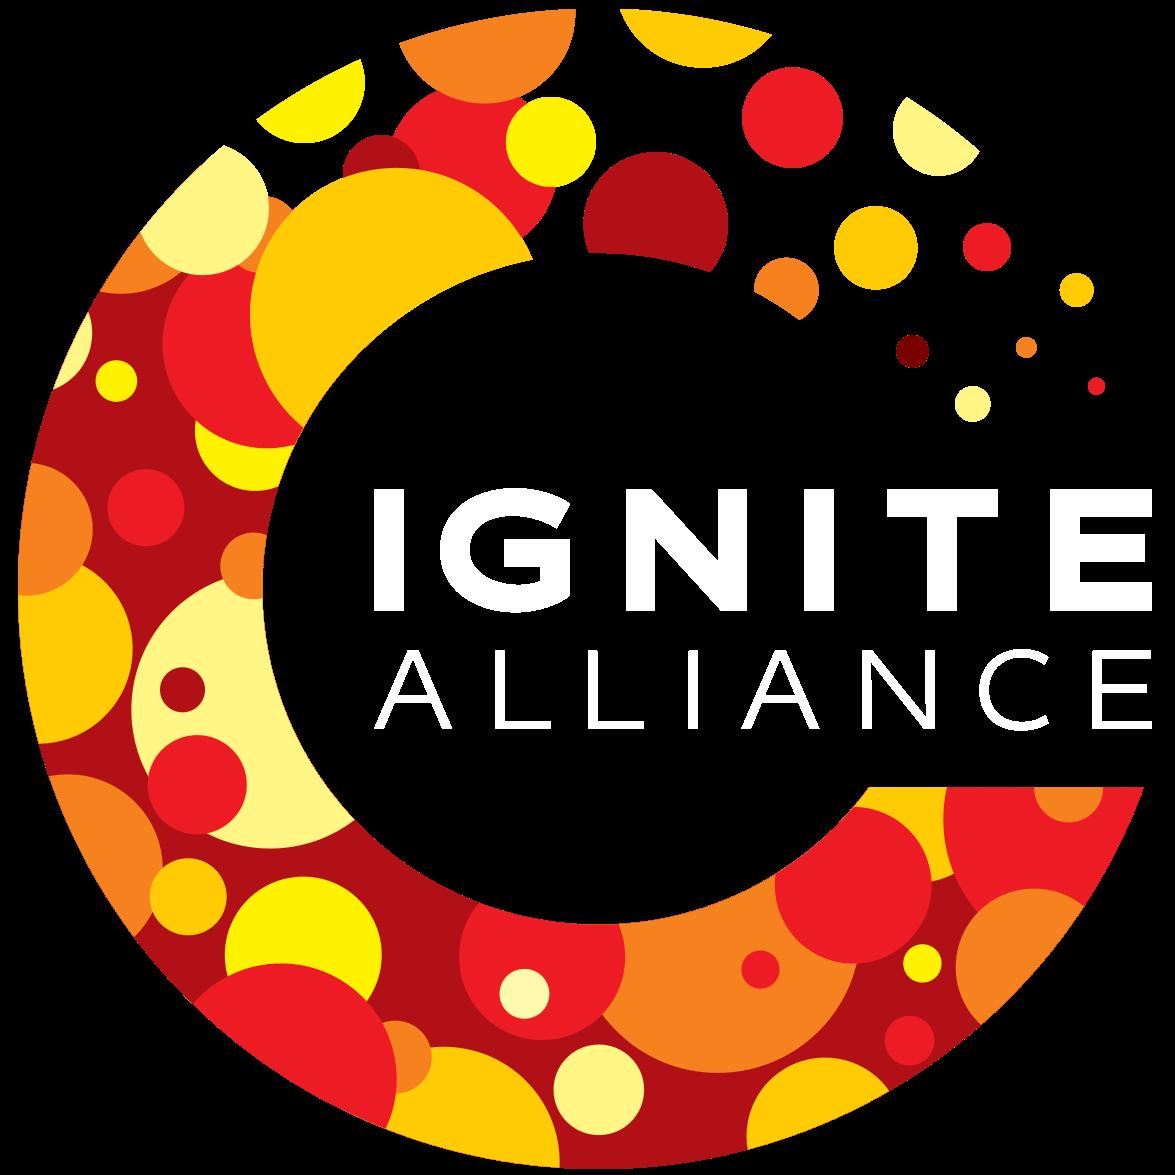 Ignite Alliance